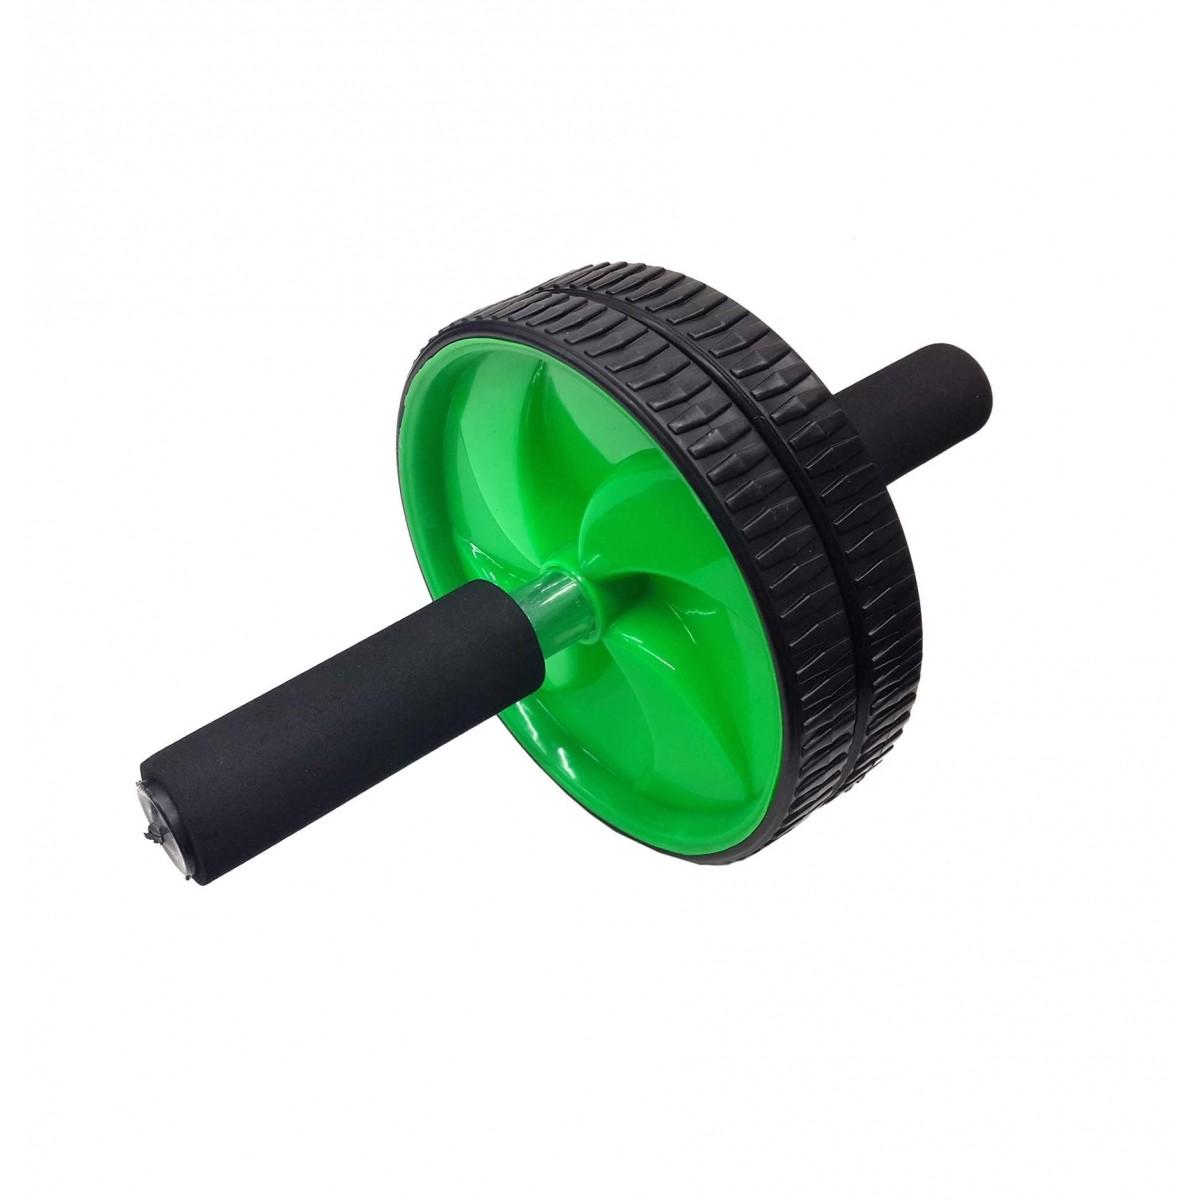 Rolo Roda Abdominal Para Exercicio Fisico Fitness Fortalecimento Abdome e Lombar Verde (BSL-JS002)